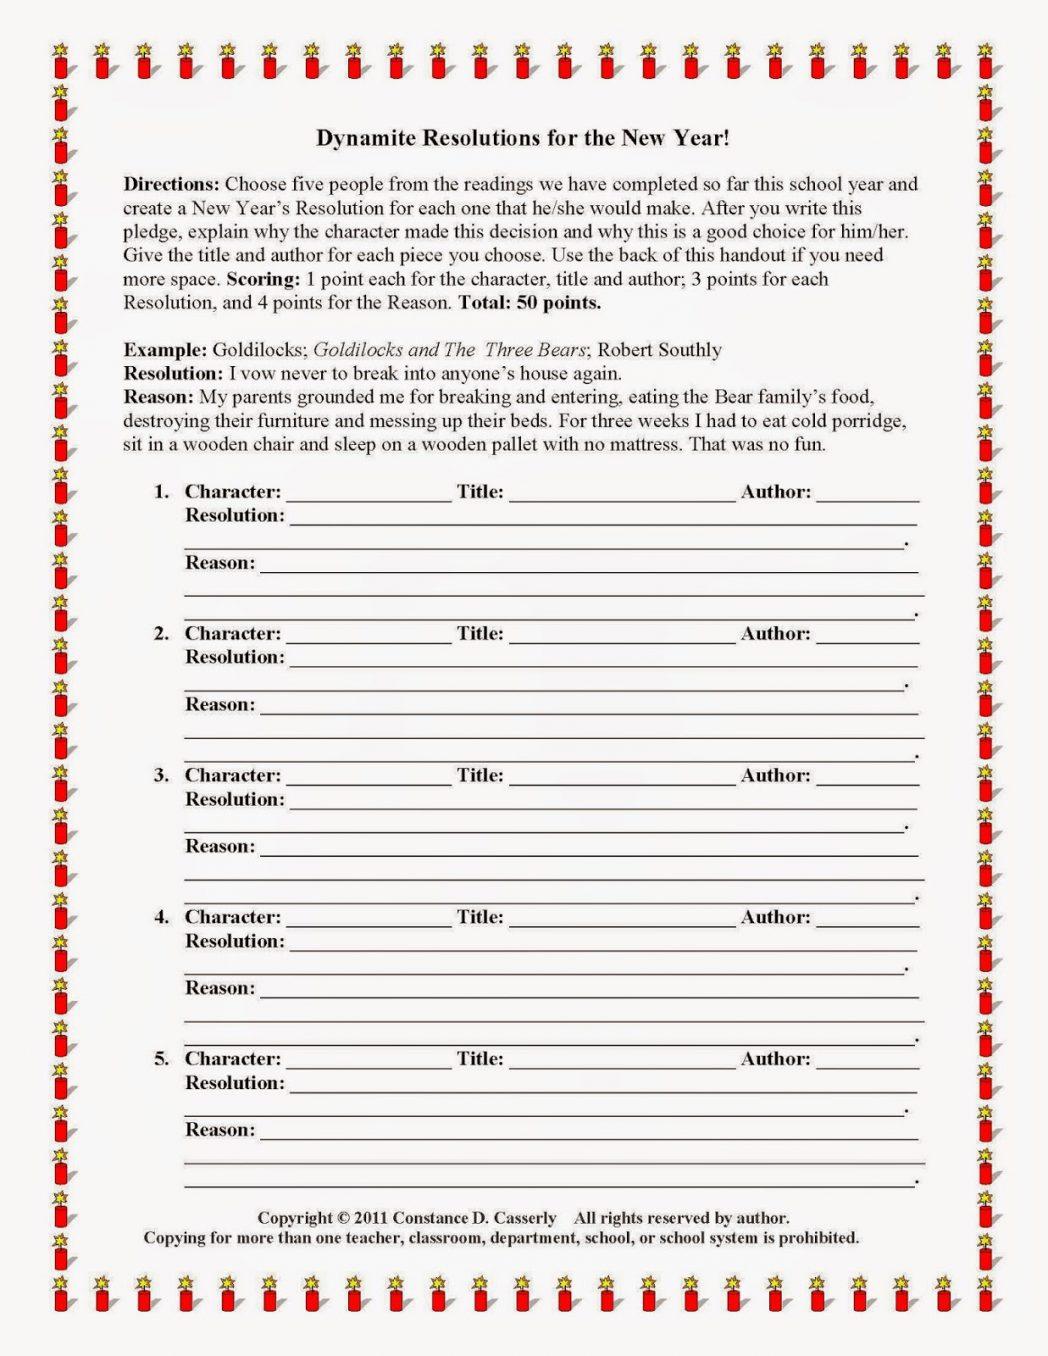 020 My New Year Resolution Essay Example On Grammar Write An Happy Activitydynamiteresolutionsforthenewyearwhitebackg Singular High School Student 2019 For Class 5 Full